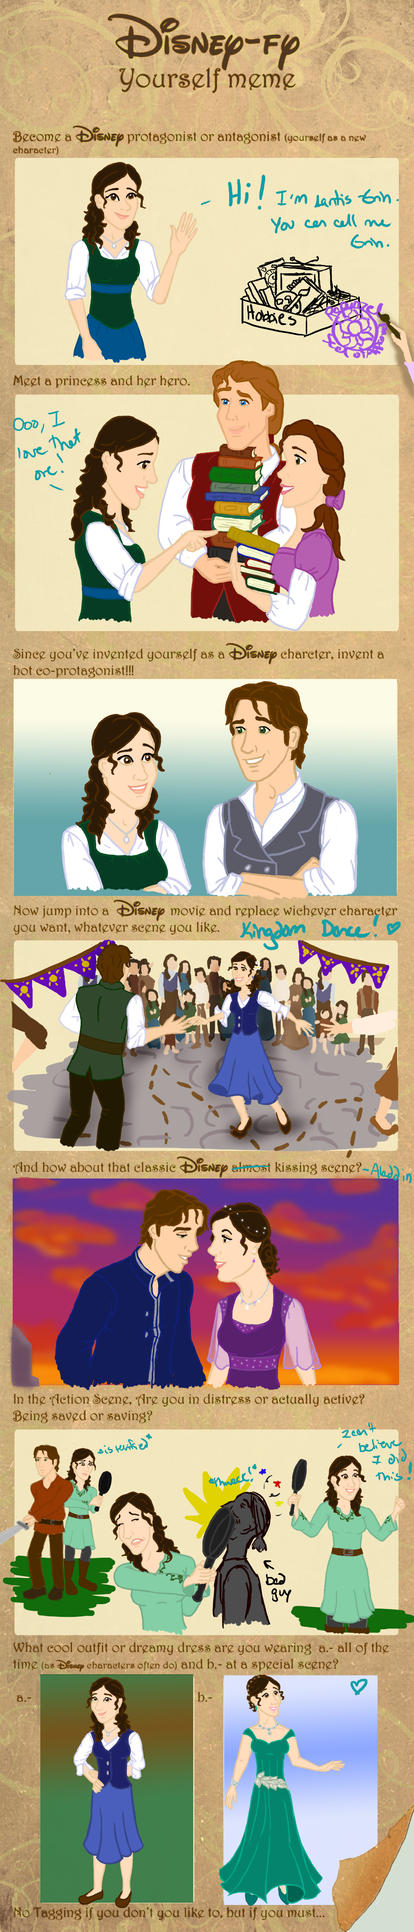 Disney-fy Yourself Meme by Lantis-Erin